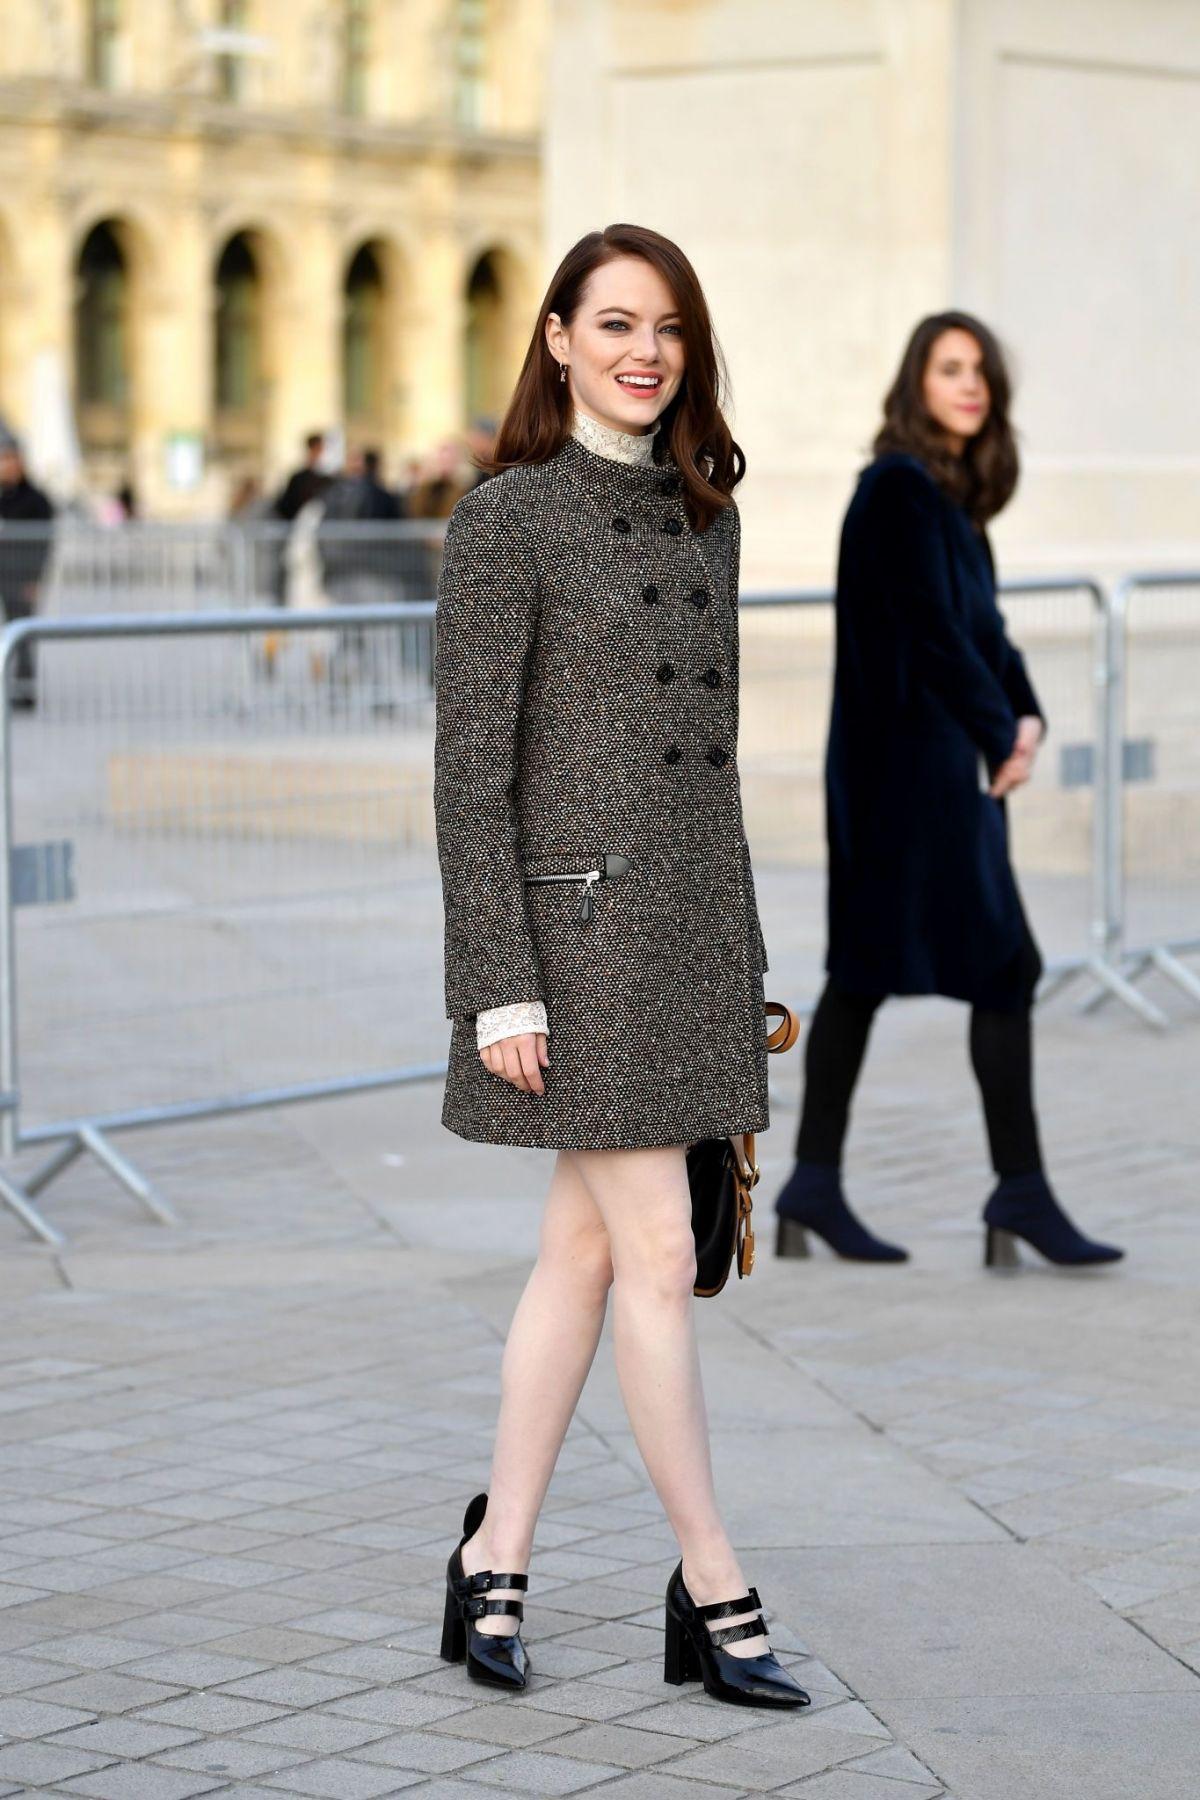 Emma Stone At Louis Vuitton Show At Paris Fashion Week 03 05 2019